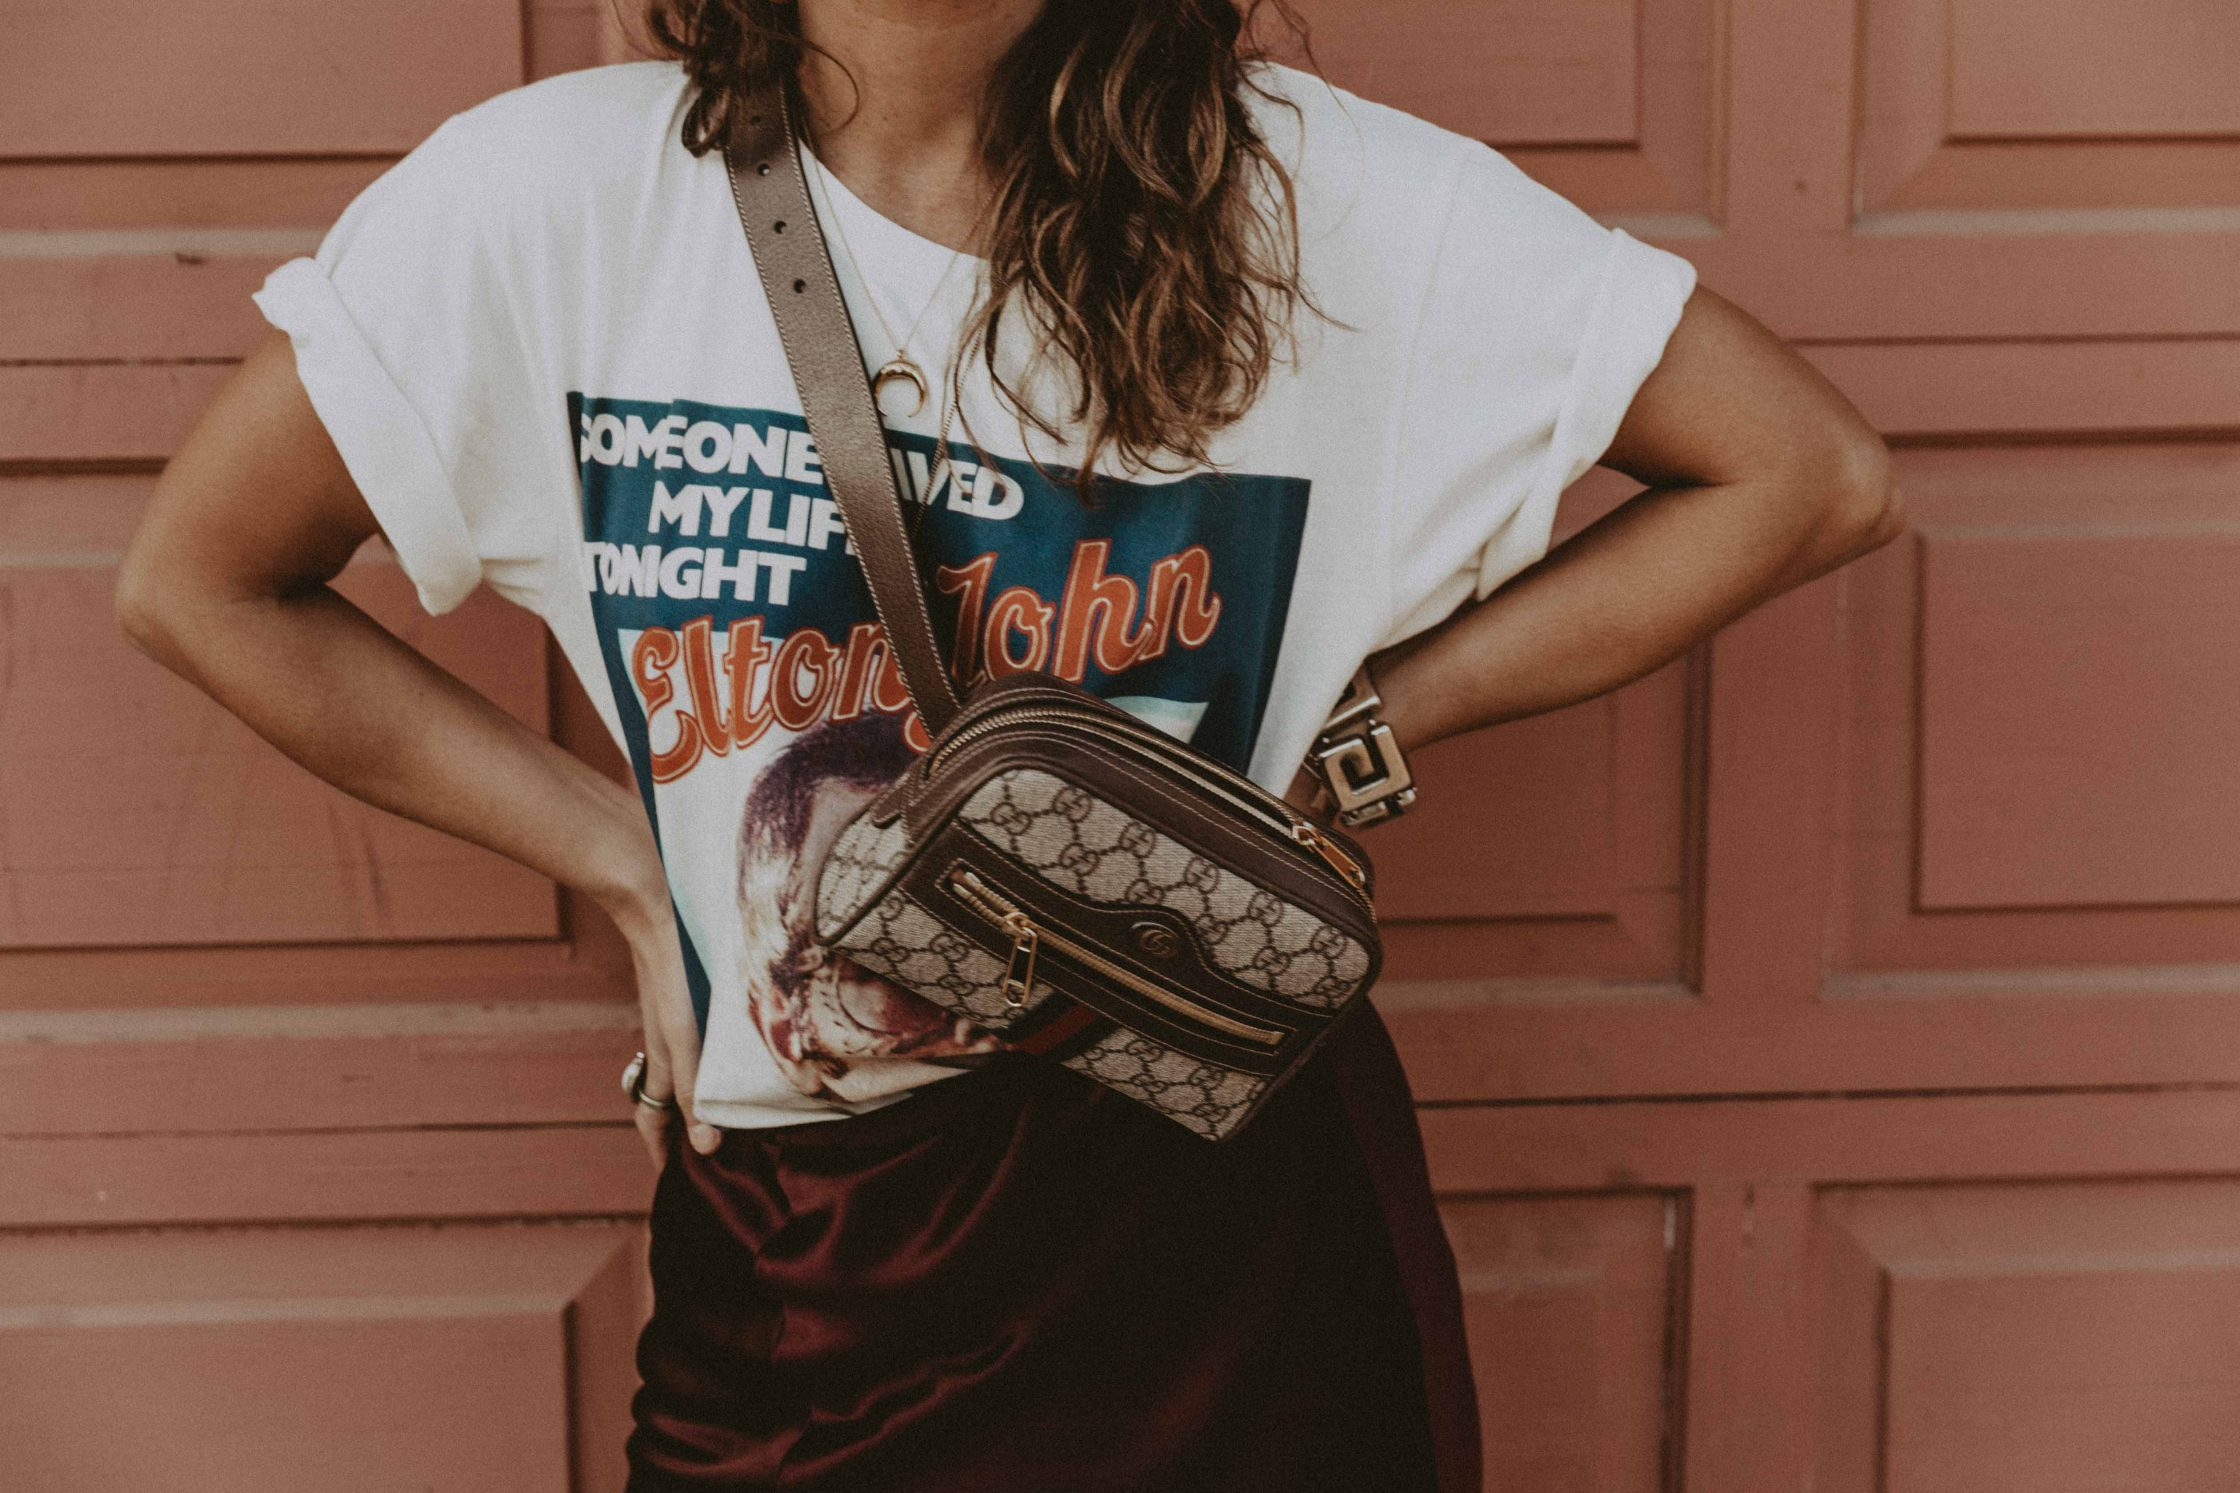 Sara of Collage Vintage wearing Joseph skirt and vintage Gucci tee